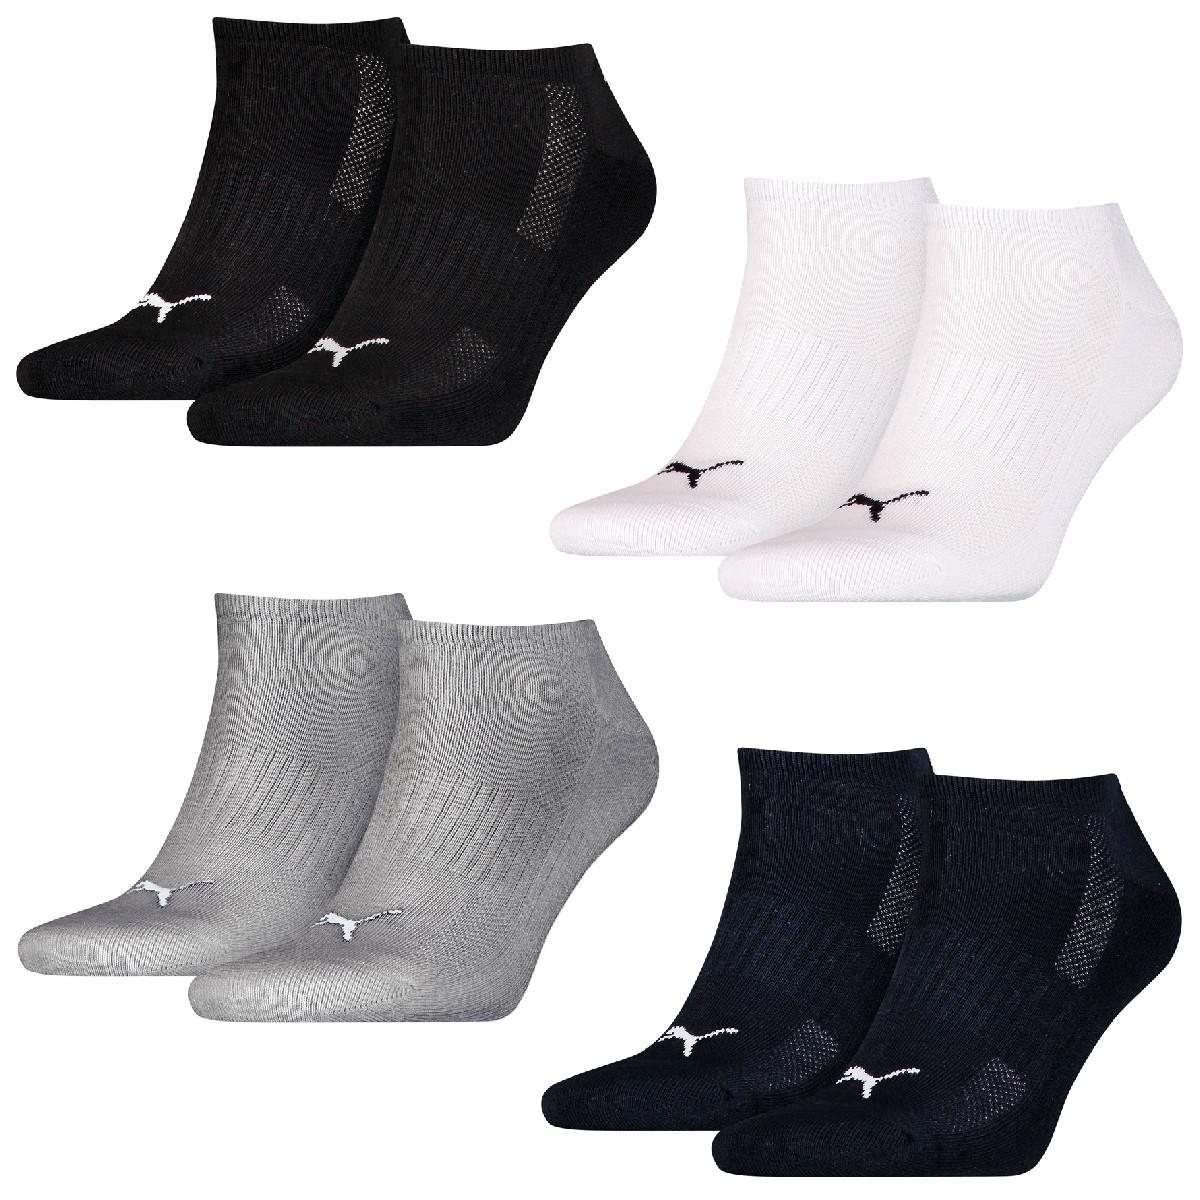 incredible prices online shop buy popular 10 Paar Puma Sneaker Socken mit Frottee-Sohle Gr. 35 - 46 ...